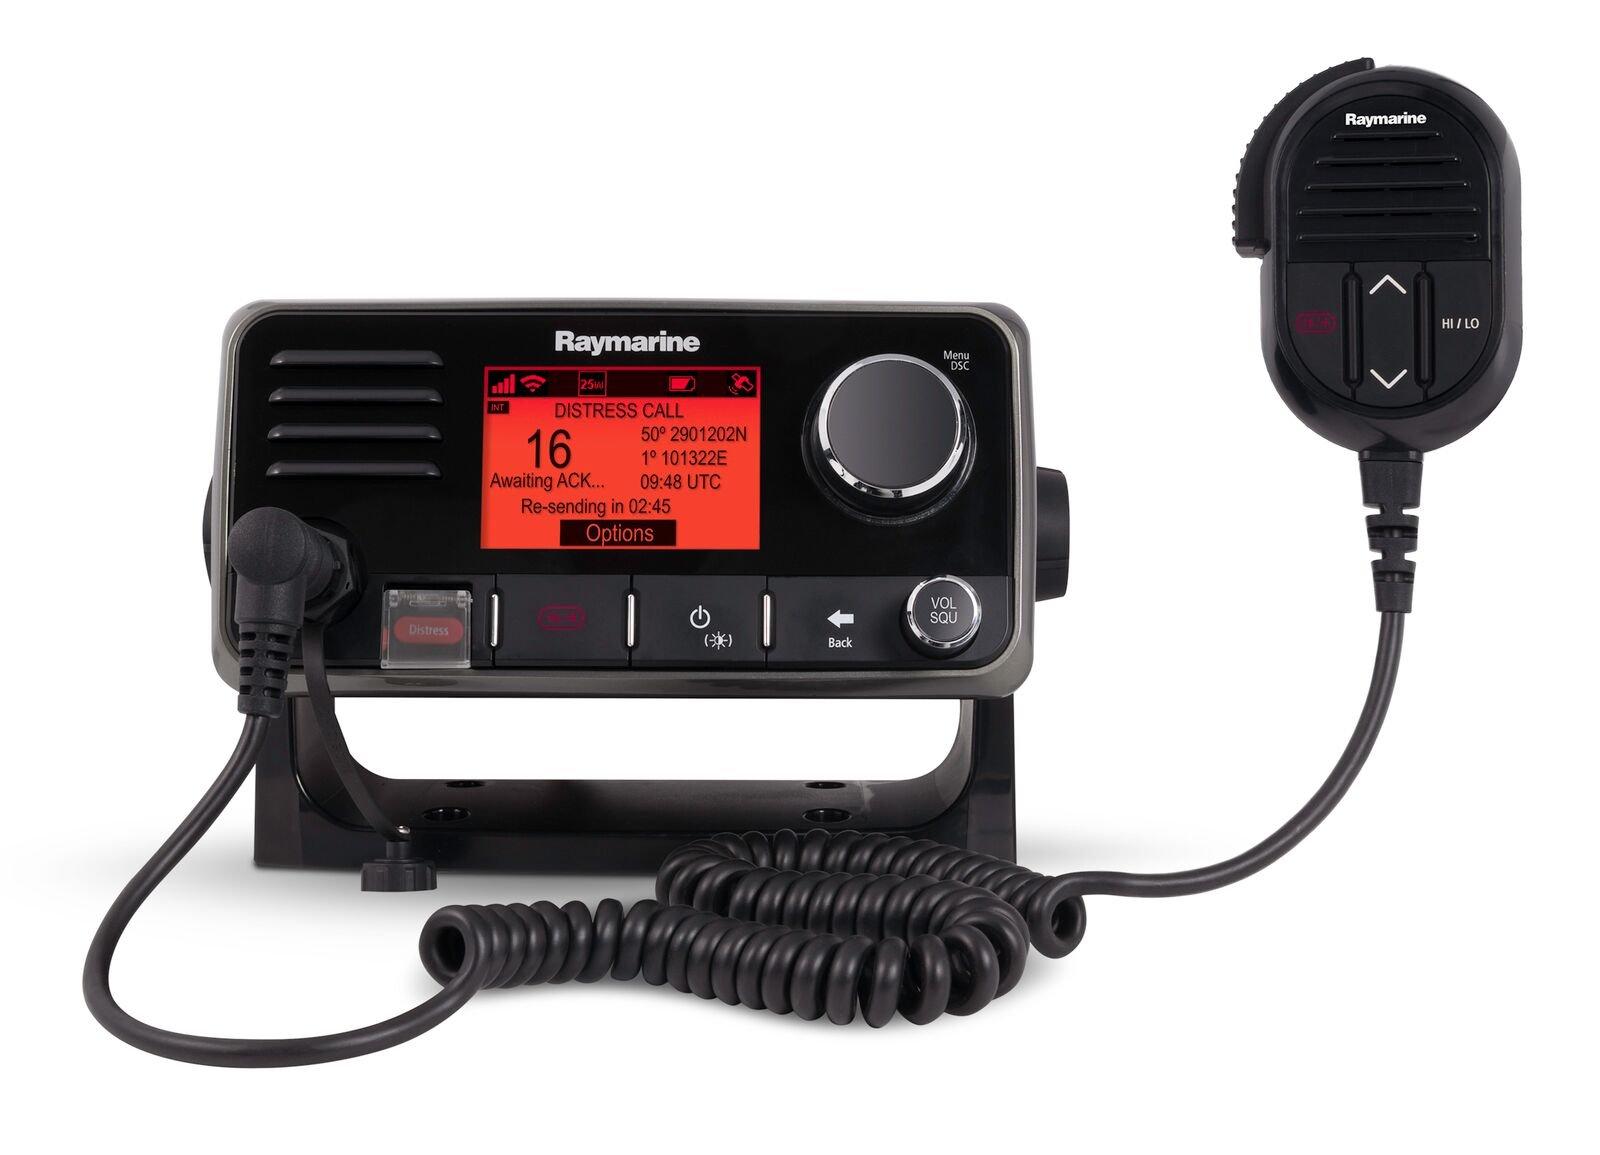 Raymarine Ray 60 Multifunction Radio